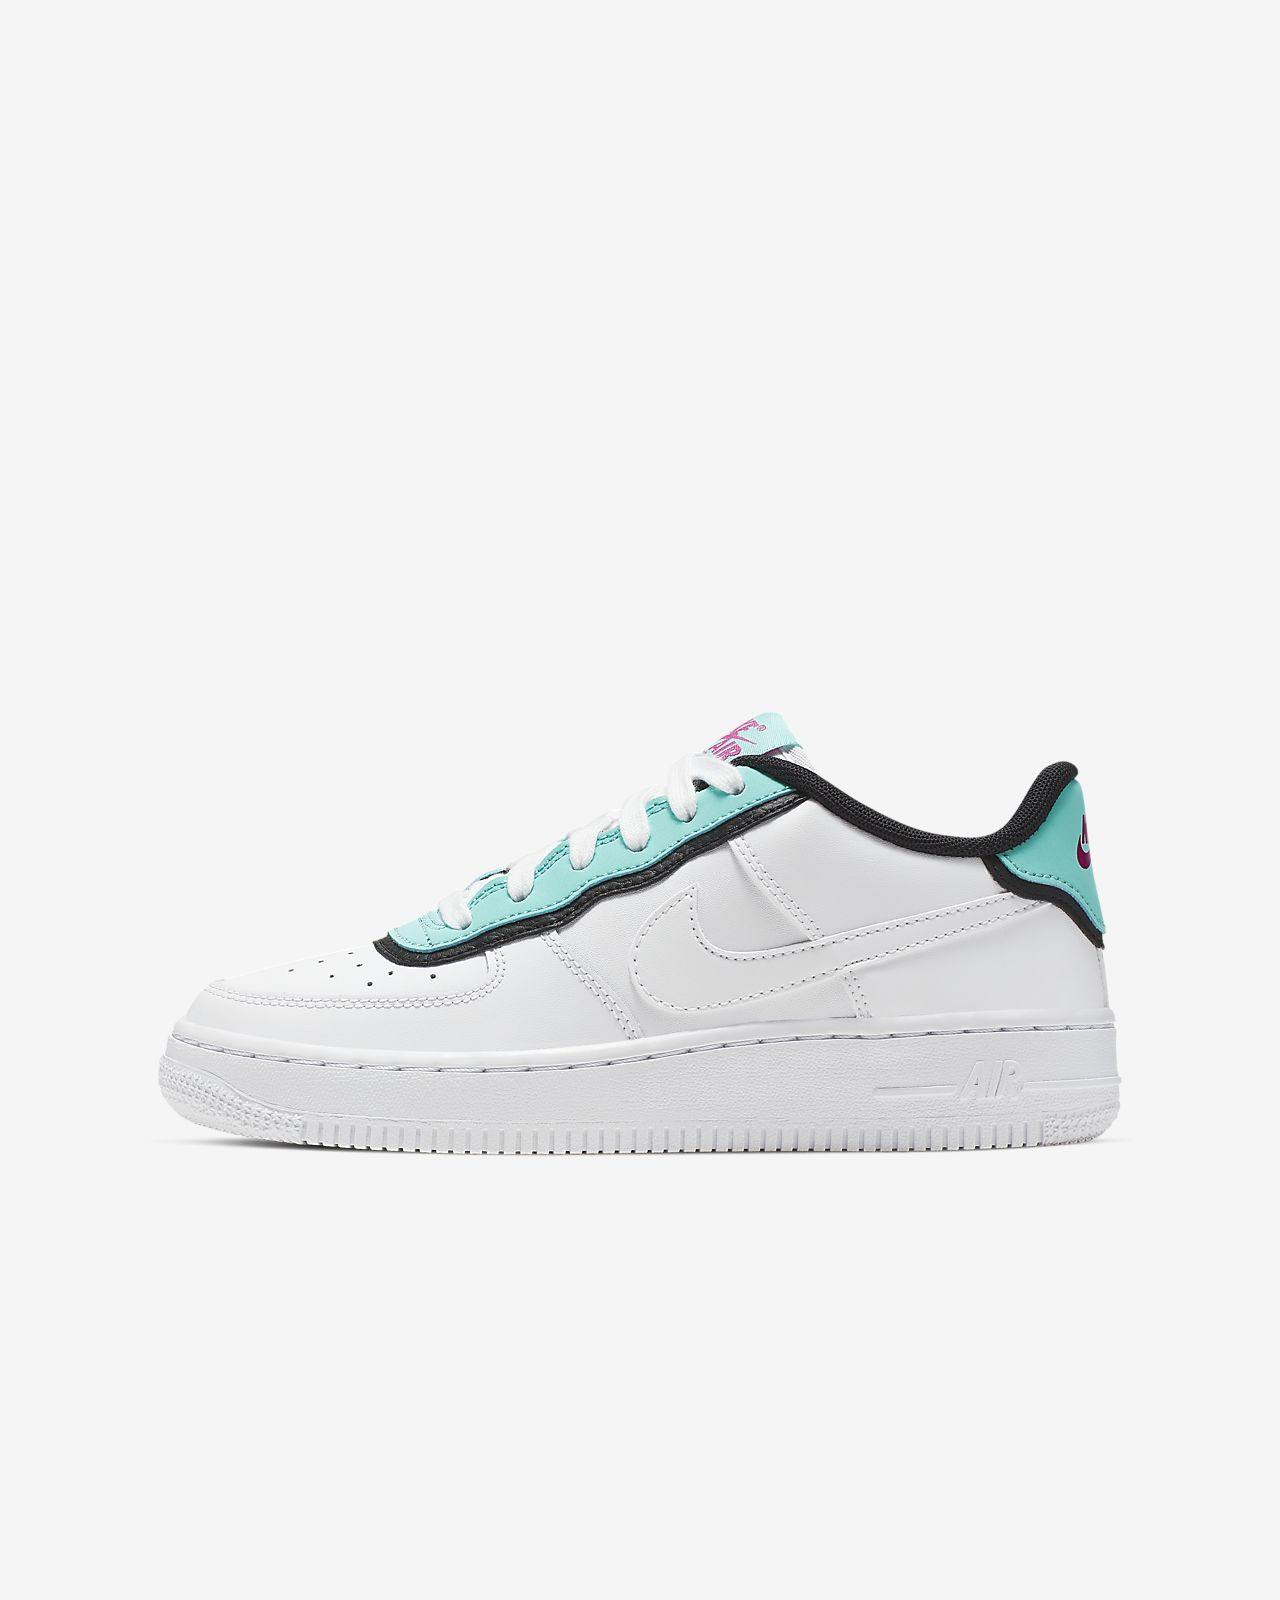 25c8ed86e29 Nike Air Force 1 LV8 1 DBL Kinderschoen. Nike.com BE